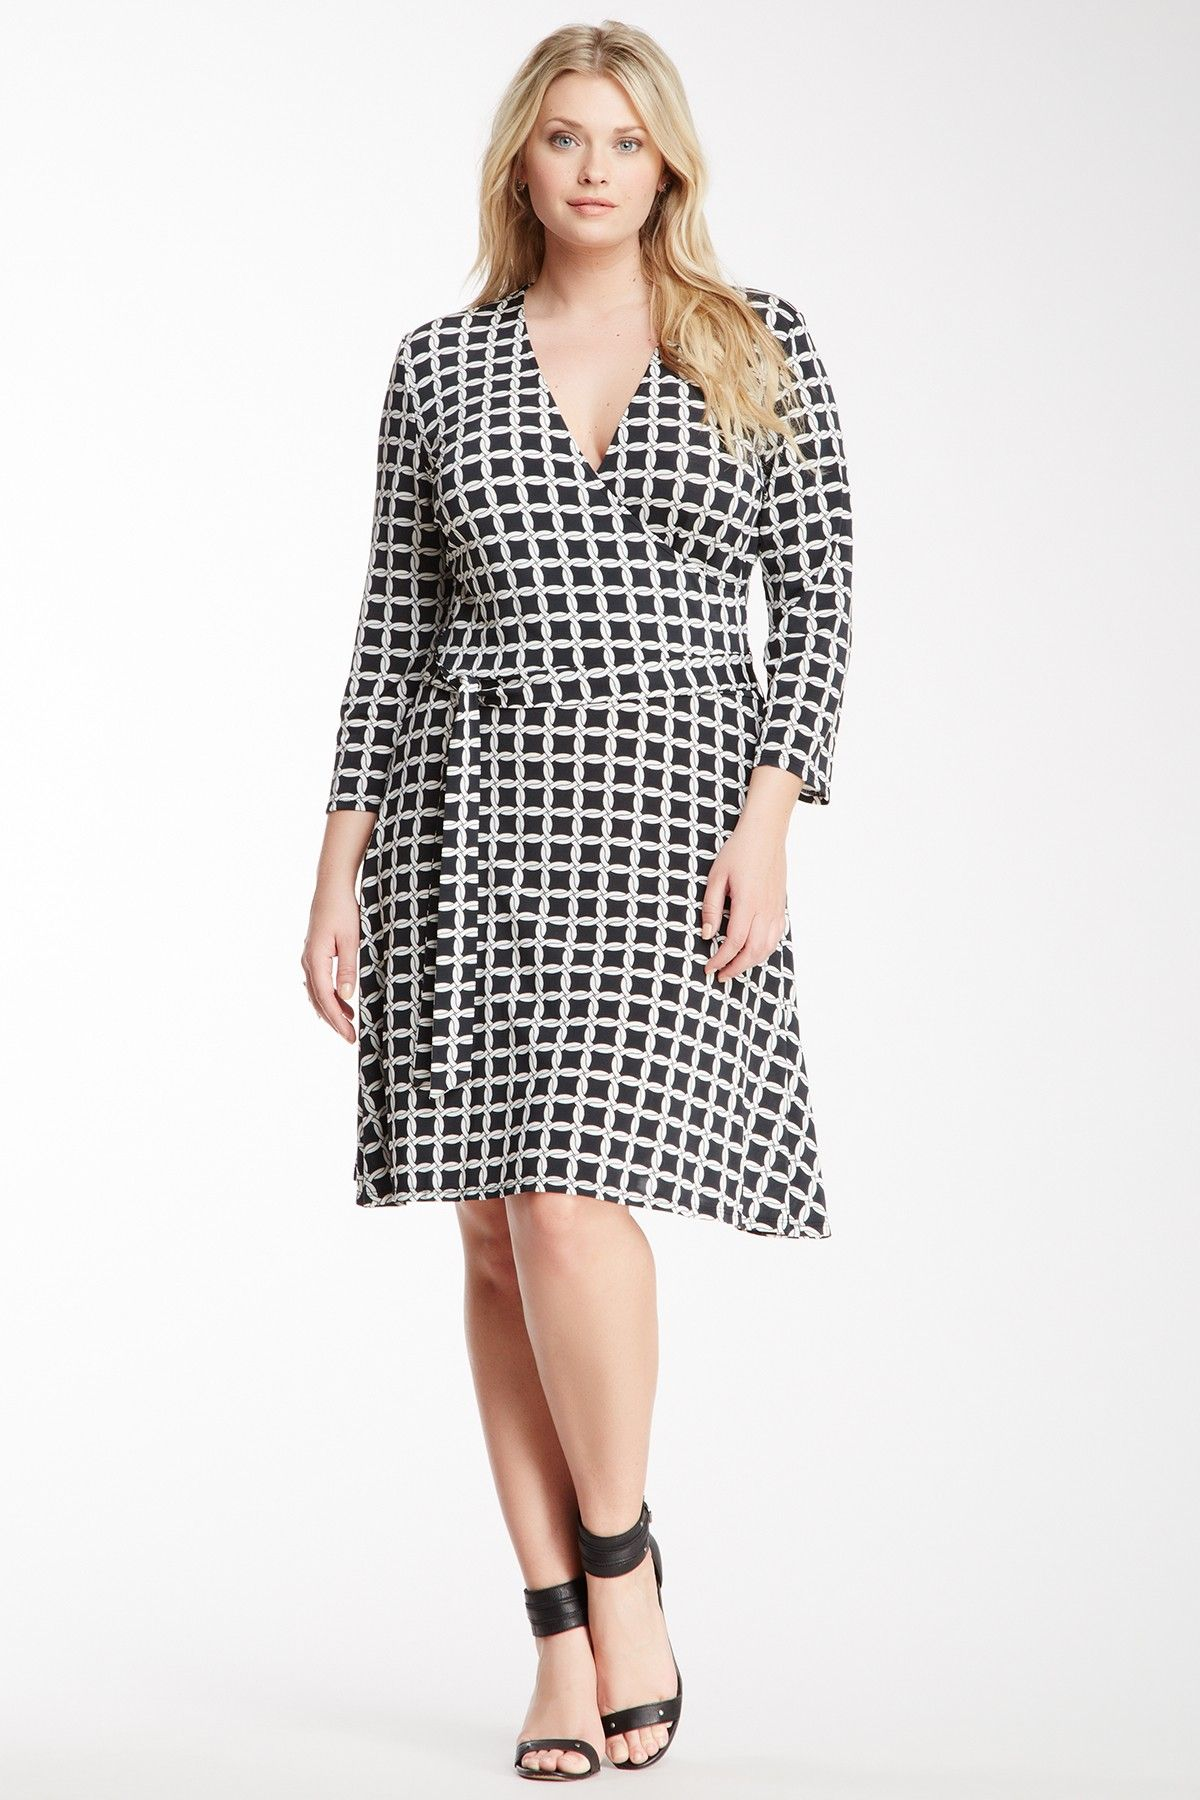 5426446852 Leota Print Long Sleeve Perfect Wrap Dress - Plus Size by Leota on   nordstrom rack